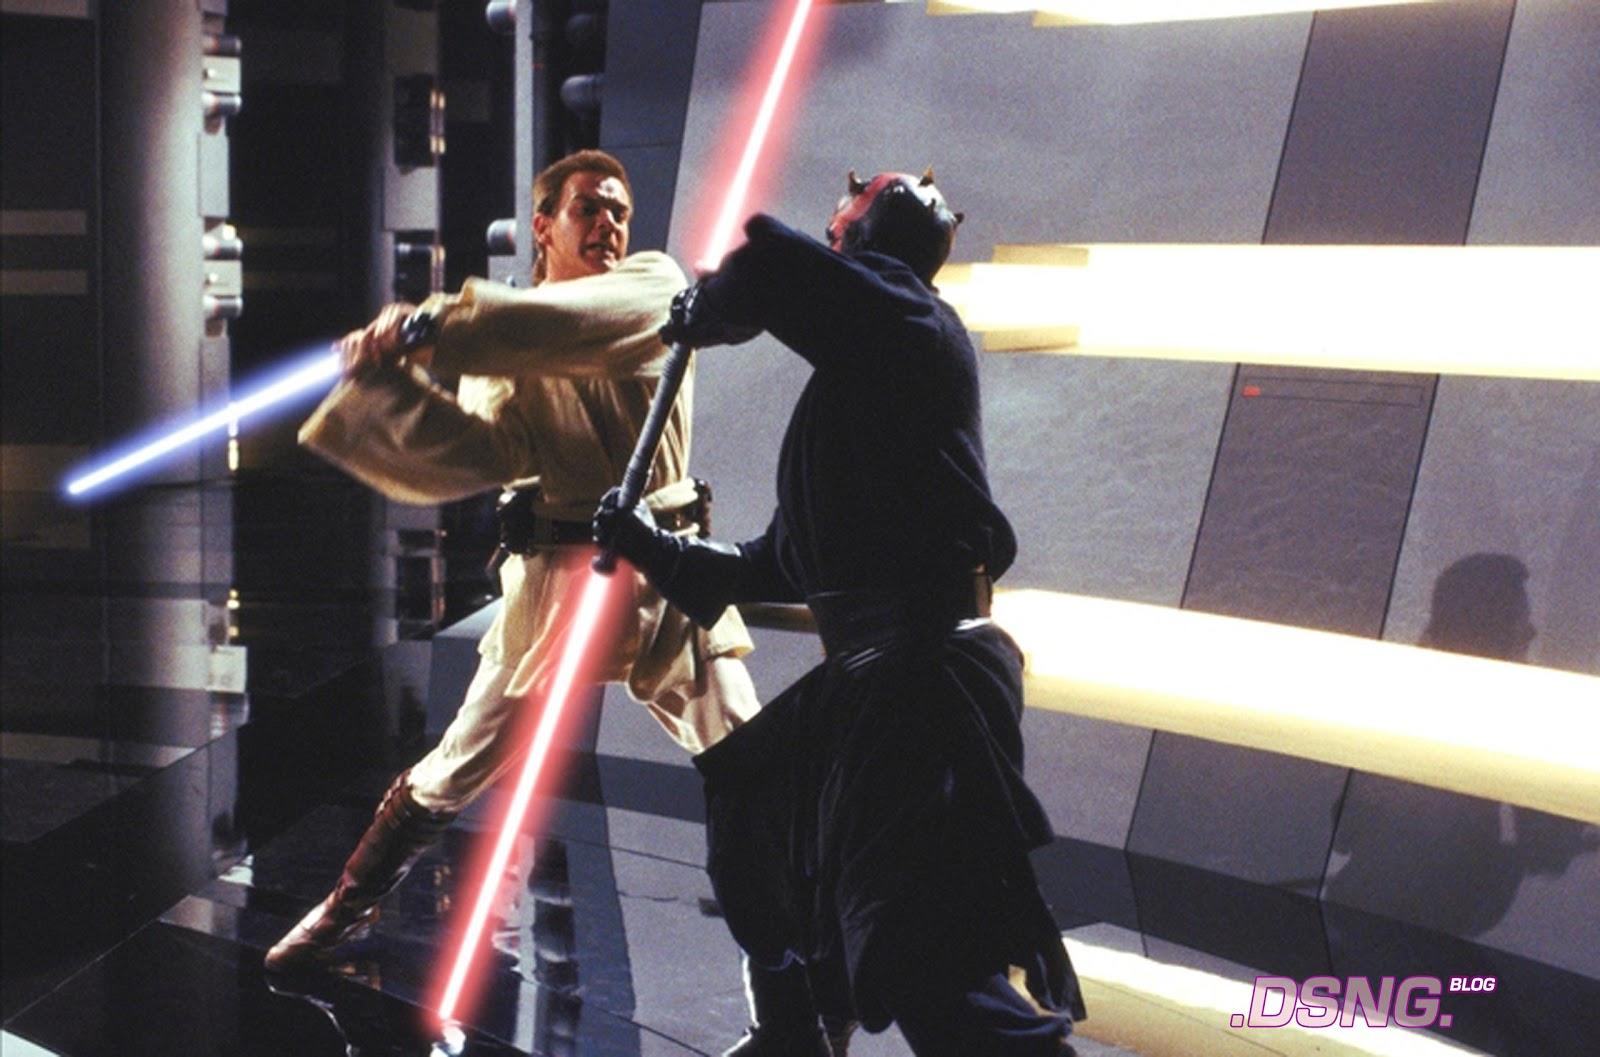 star war episode i 3d wallpapers - Star Wars Episode 1 Wallpapers Wallpaper Cave